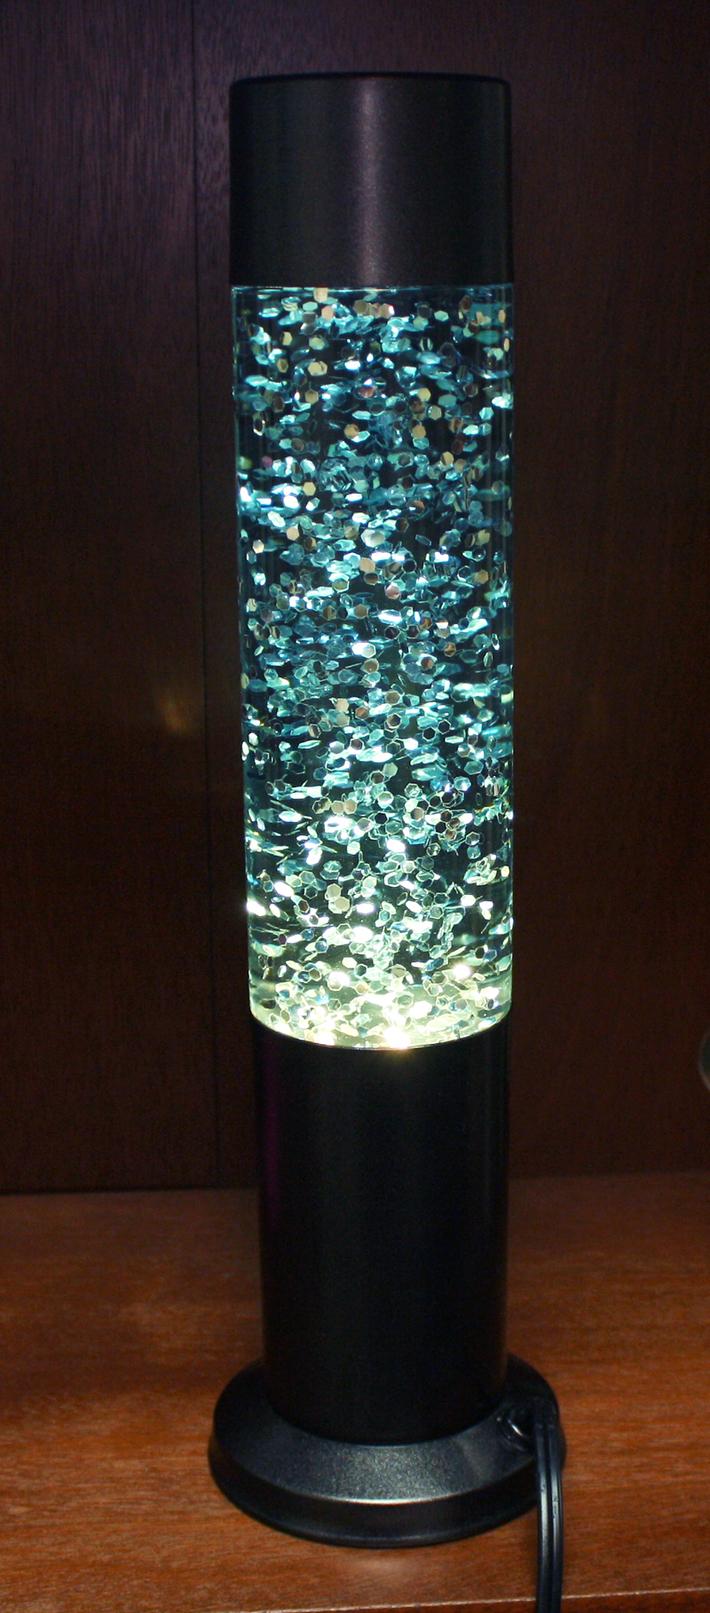 Glitter lamp customized by Loren Hall/Mark Hand